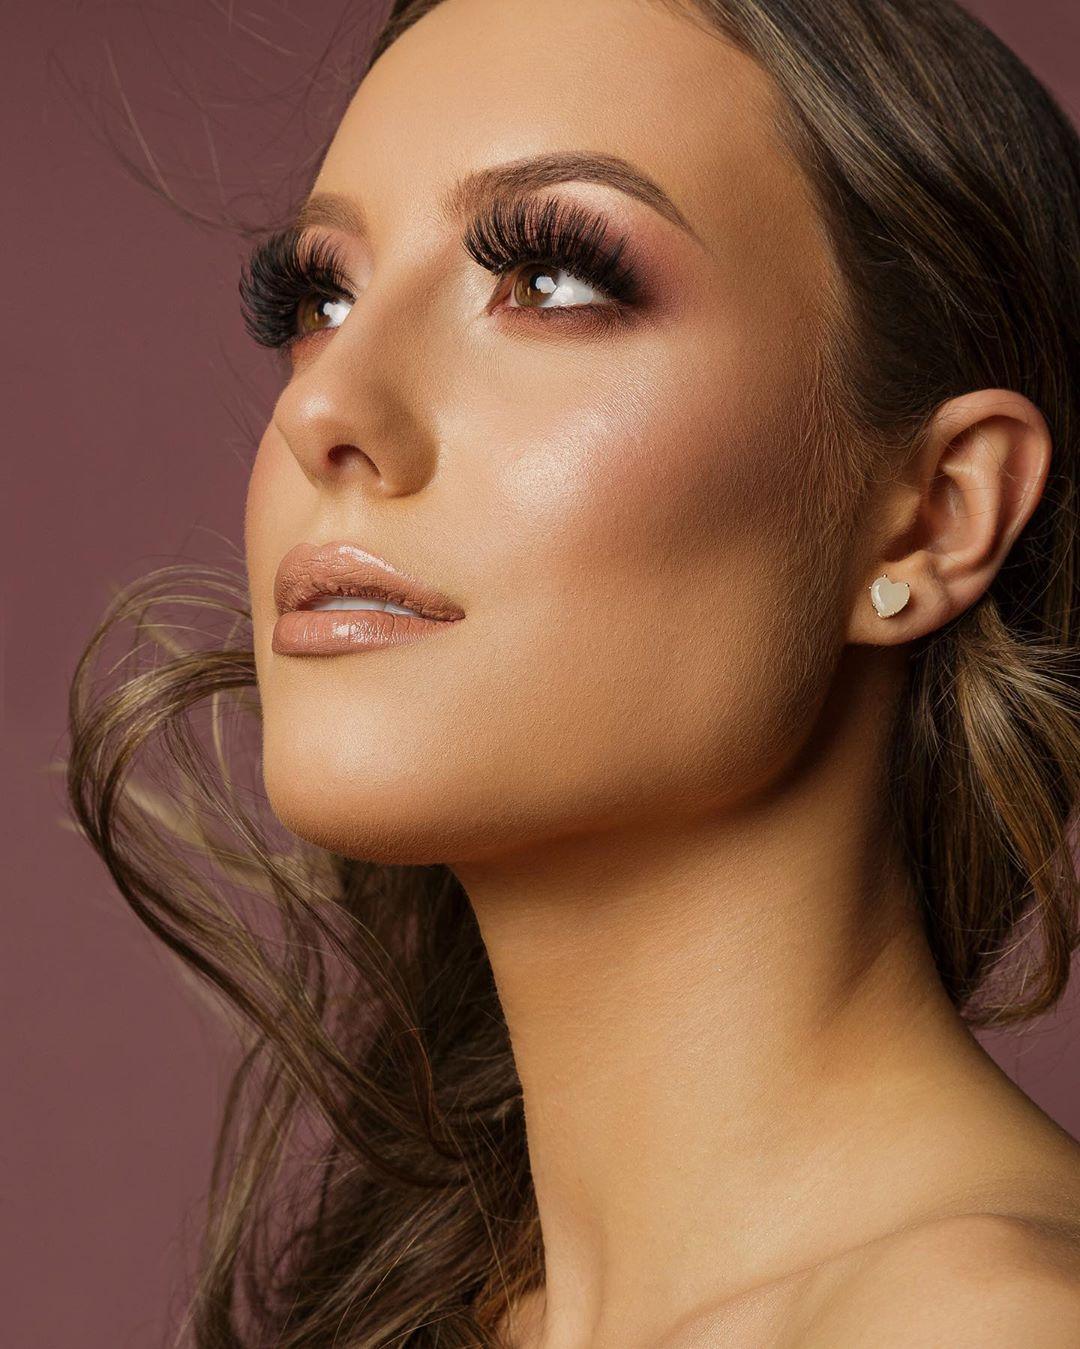 cristine boff sartor, segunda finalista de miss latinoamerica 2019. - Página 6 69633710